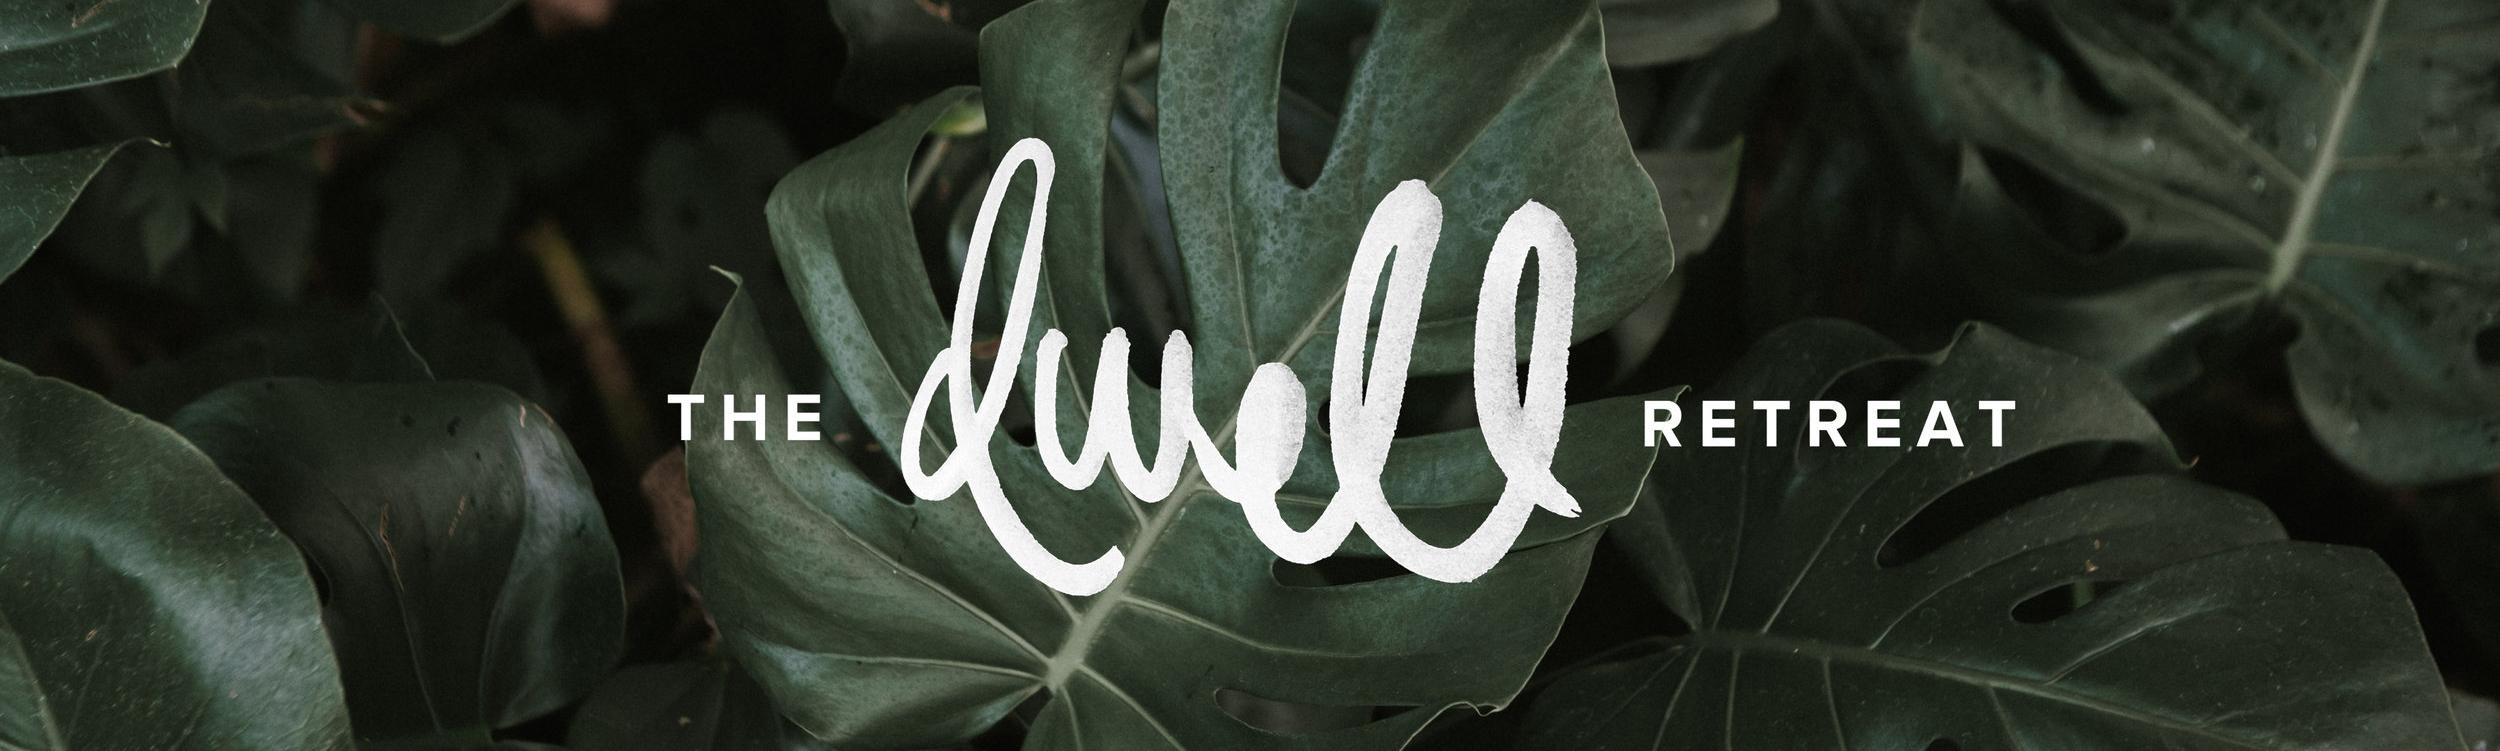 the-dwell-retreat.jpg